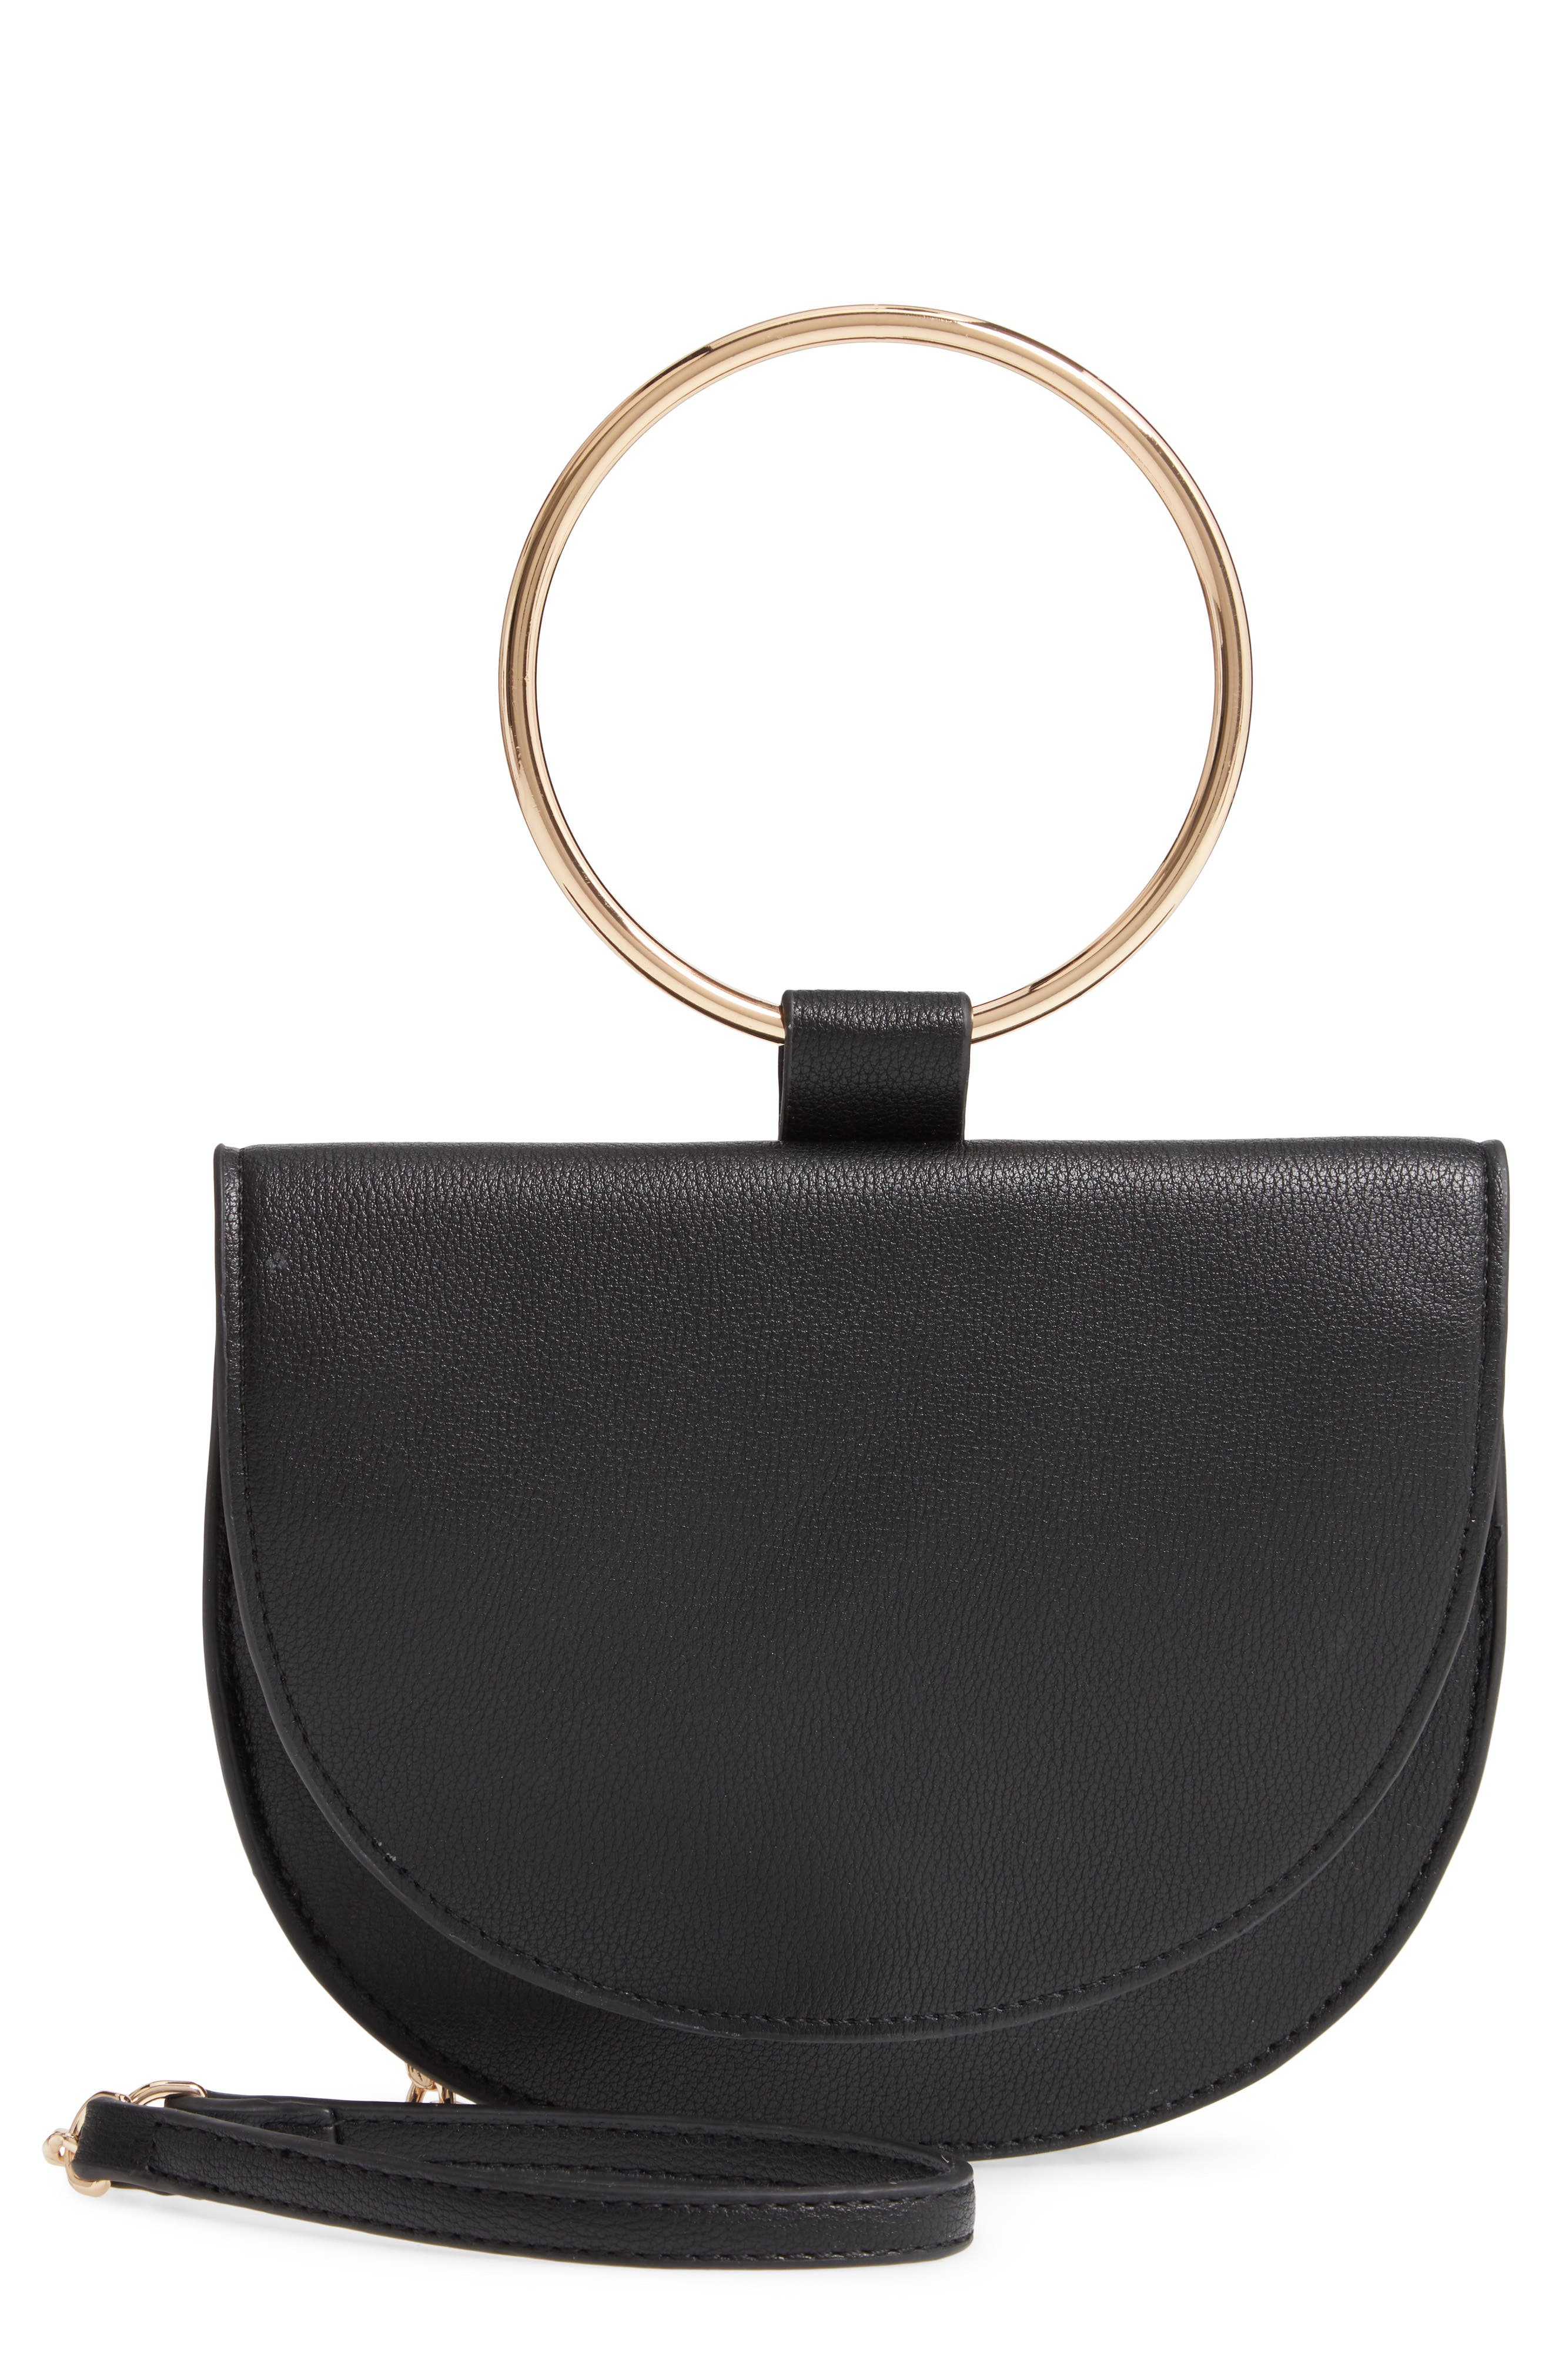 TROUVÉ Reese Faux Leather Ring Crossbody Bag, Main, color, BLACK